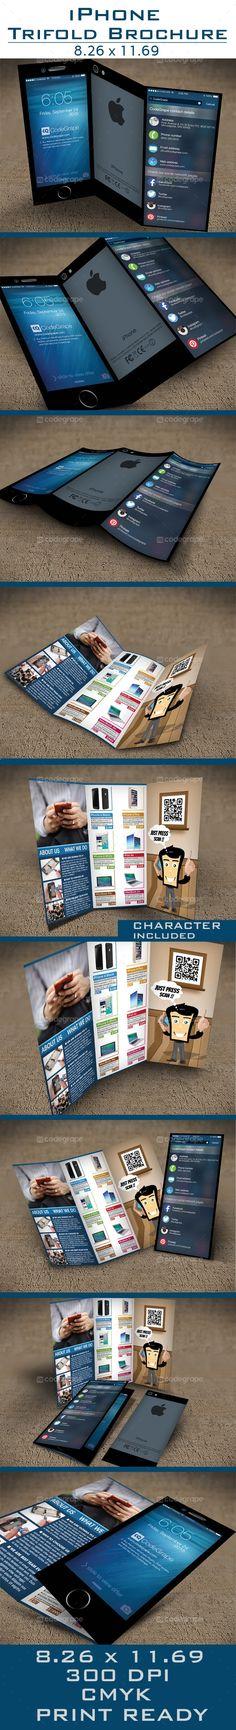 iPhone Tri-Fold Brochure - http://www.codegrape.com/item/iphone-tri-fold-brochure/5388